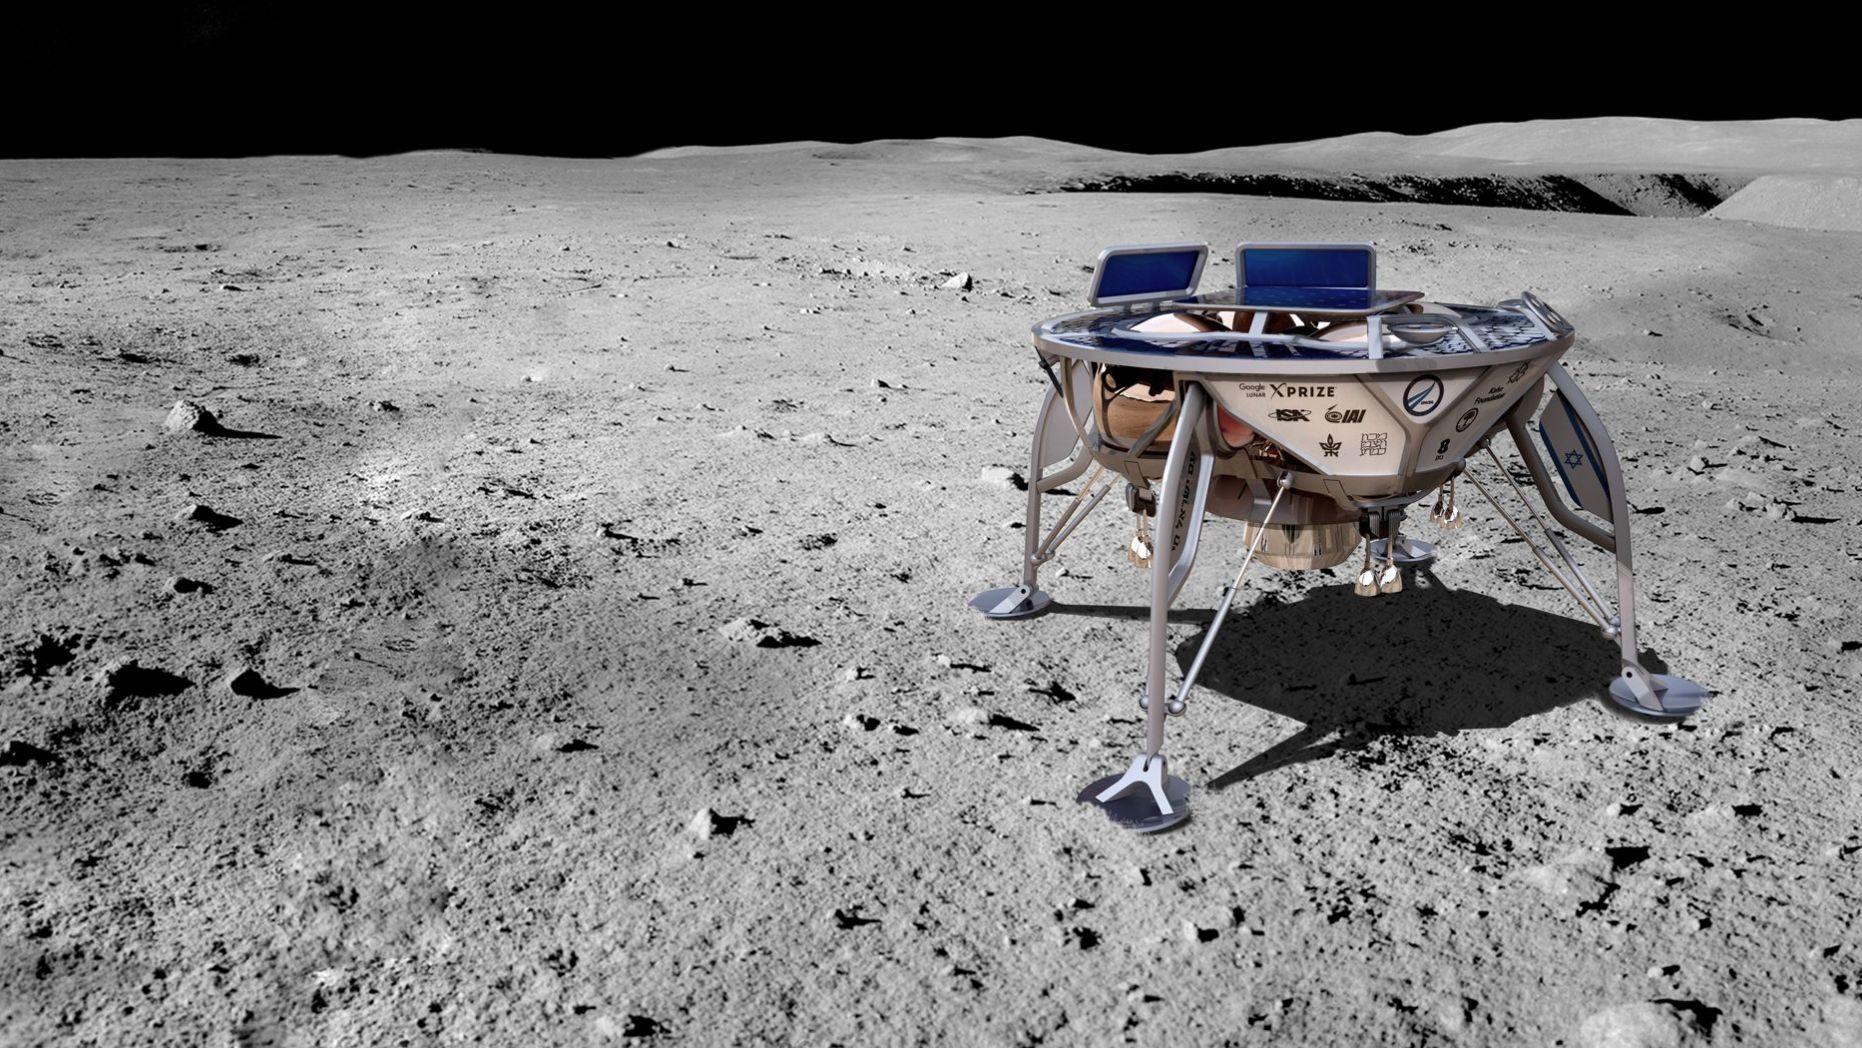 Израильский аппарат «Берешит» разбился при посадке наЛуну